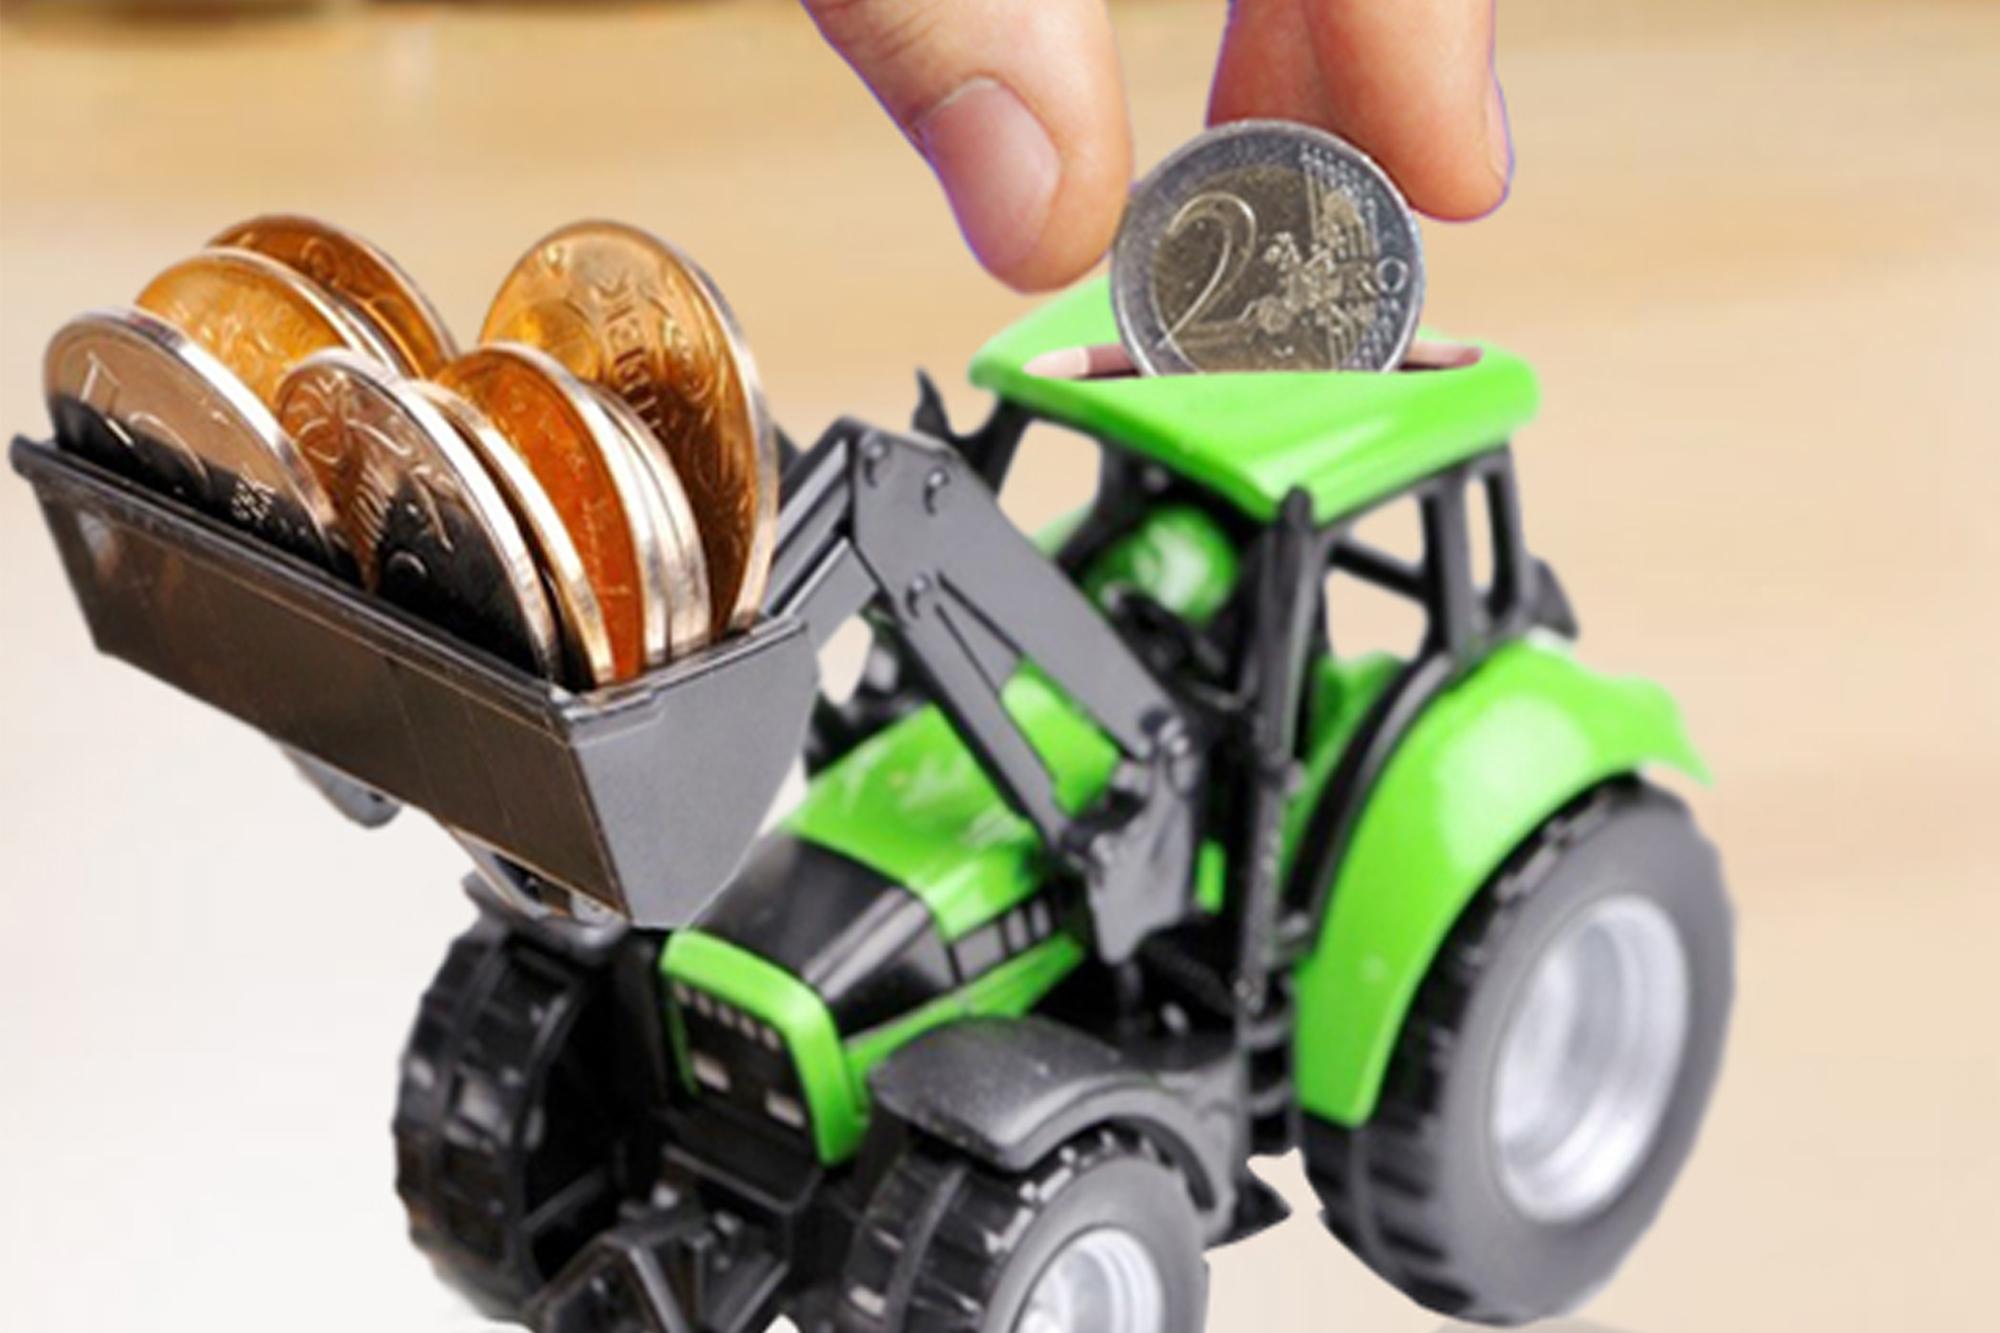 Choosing the right Equipment Finance